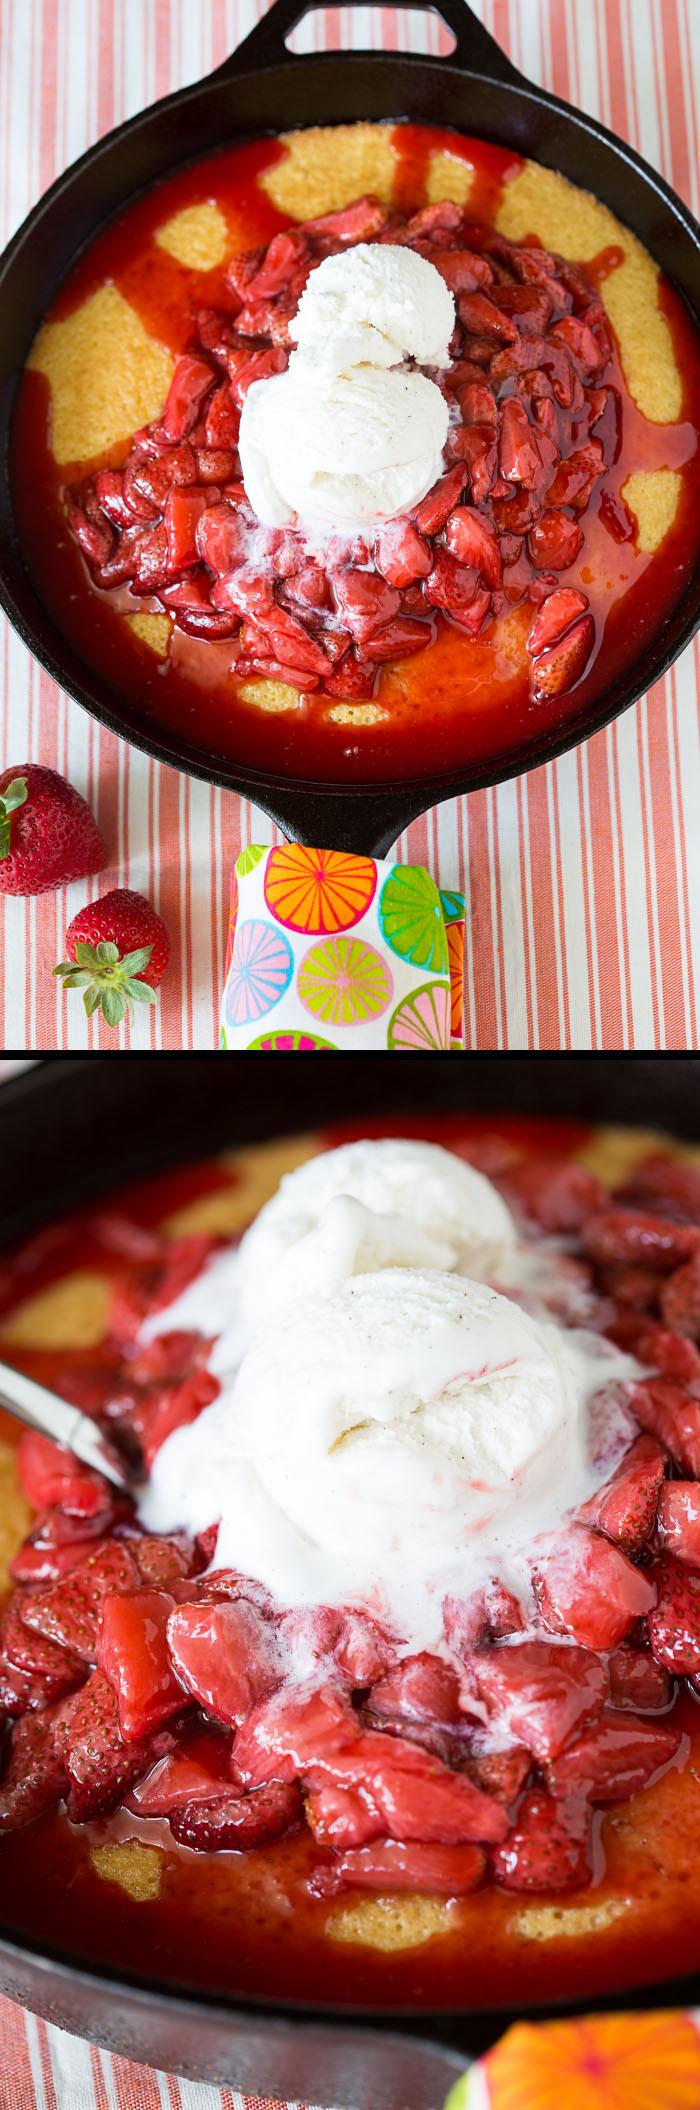 Hot Strawberry Cake with Ice Cream